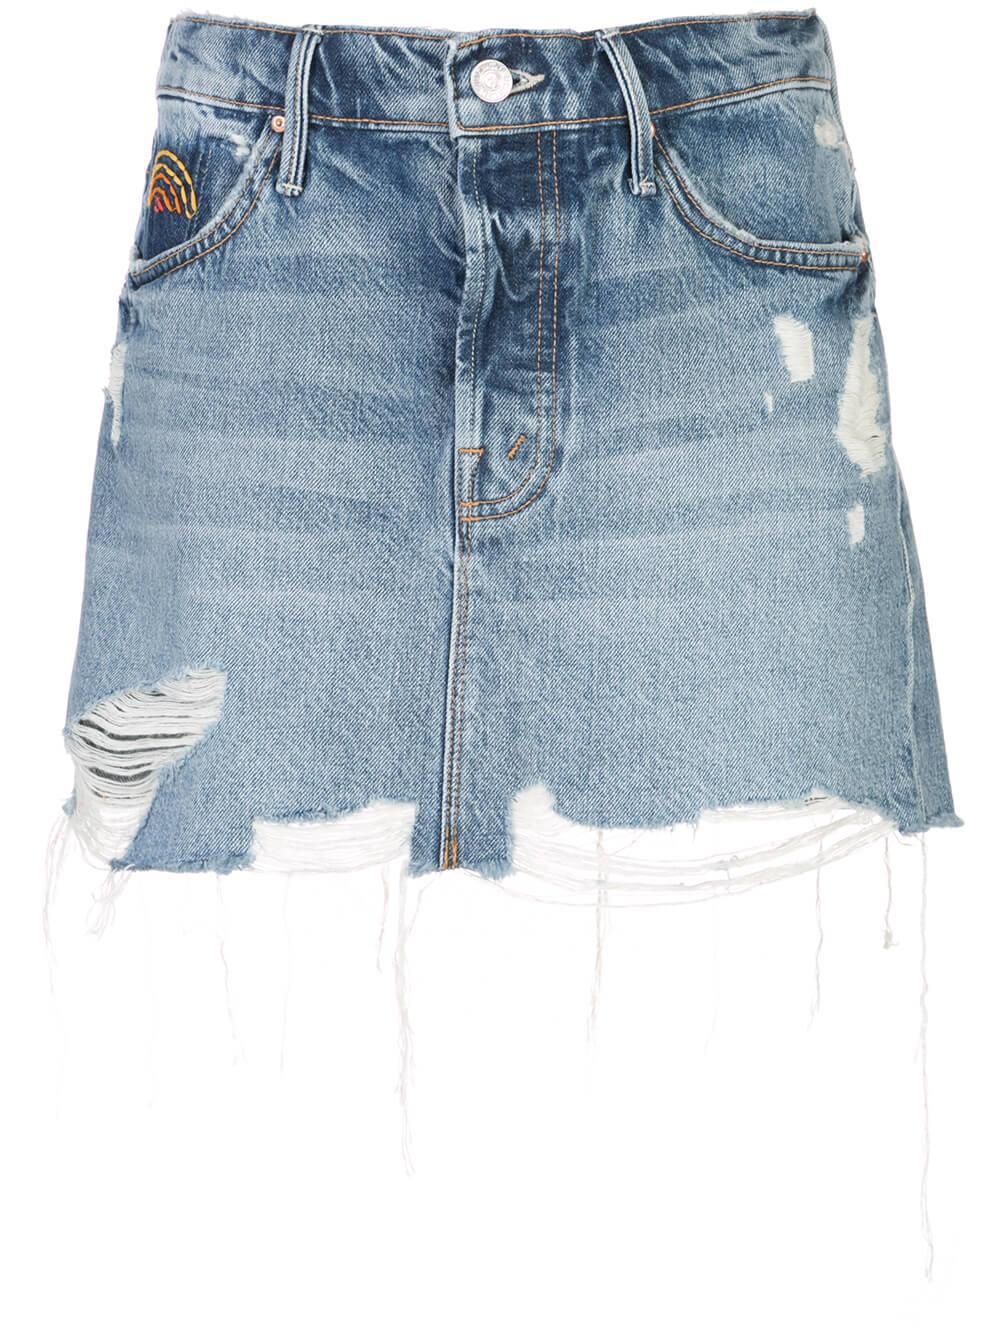 Vagabond Mini Jean Skirt Item # 9241-313